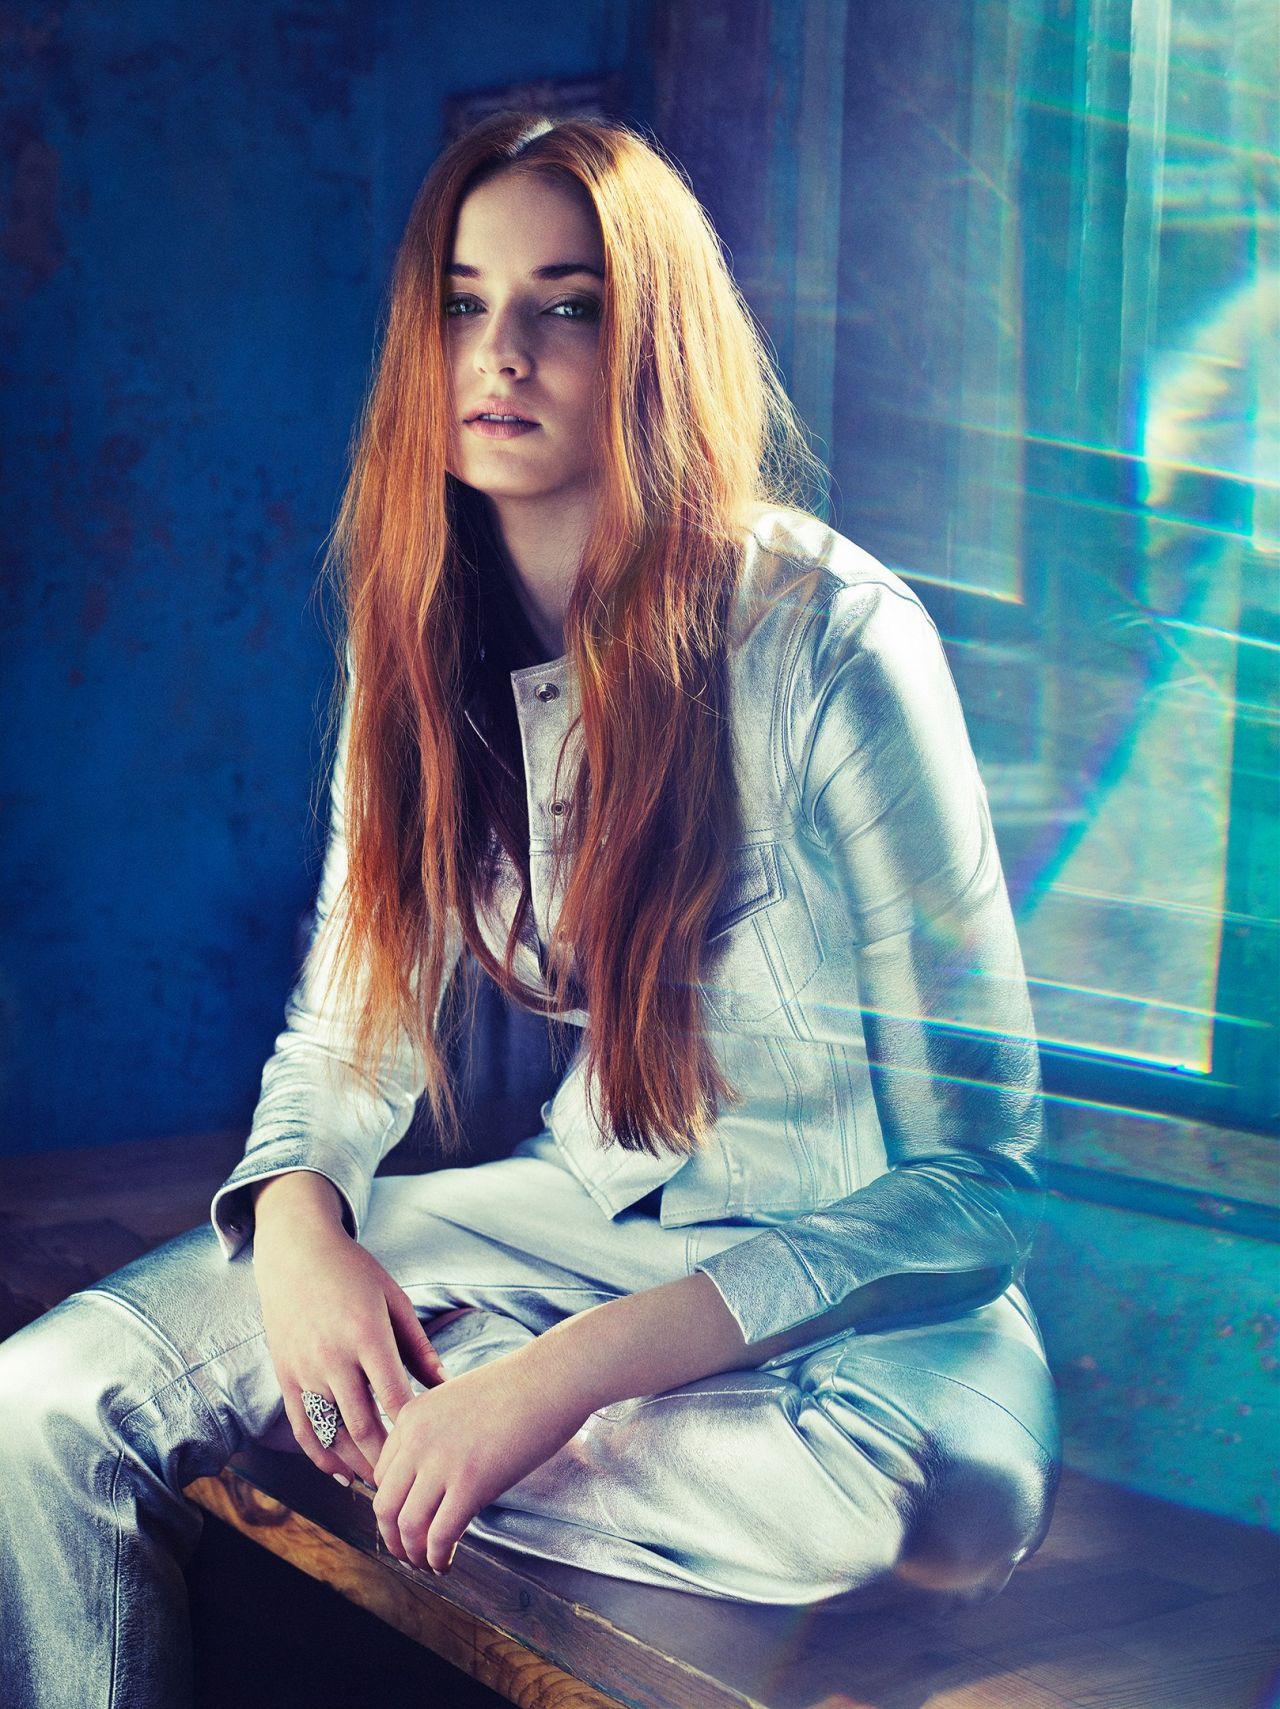 Sophie Turner - Photoshoot For Nylon Magazine April 2016-4256